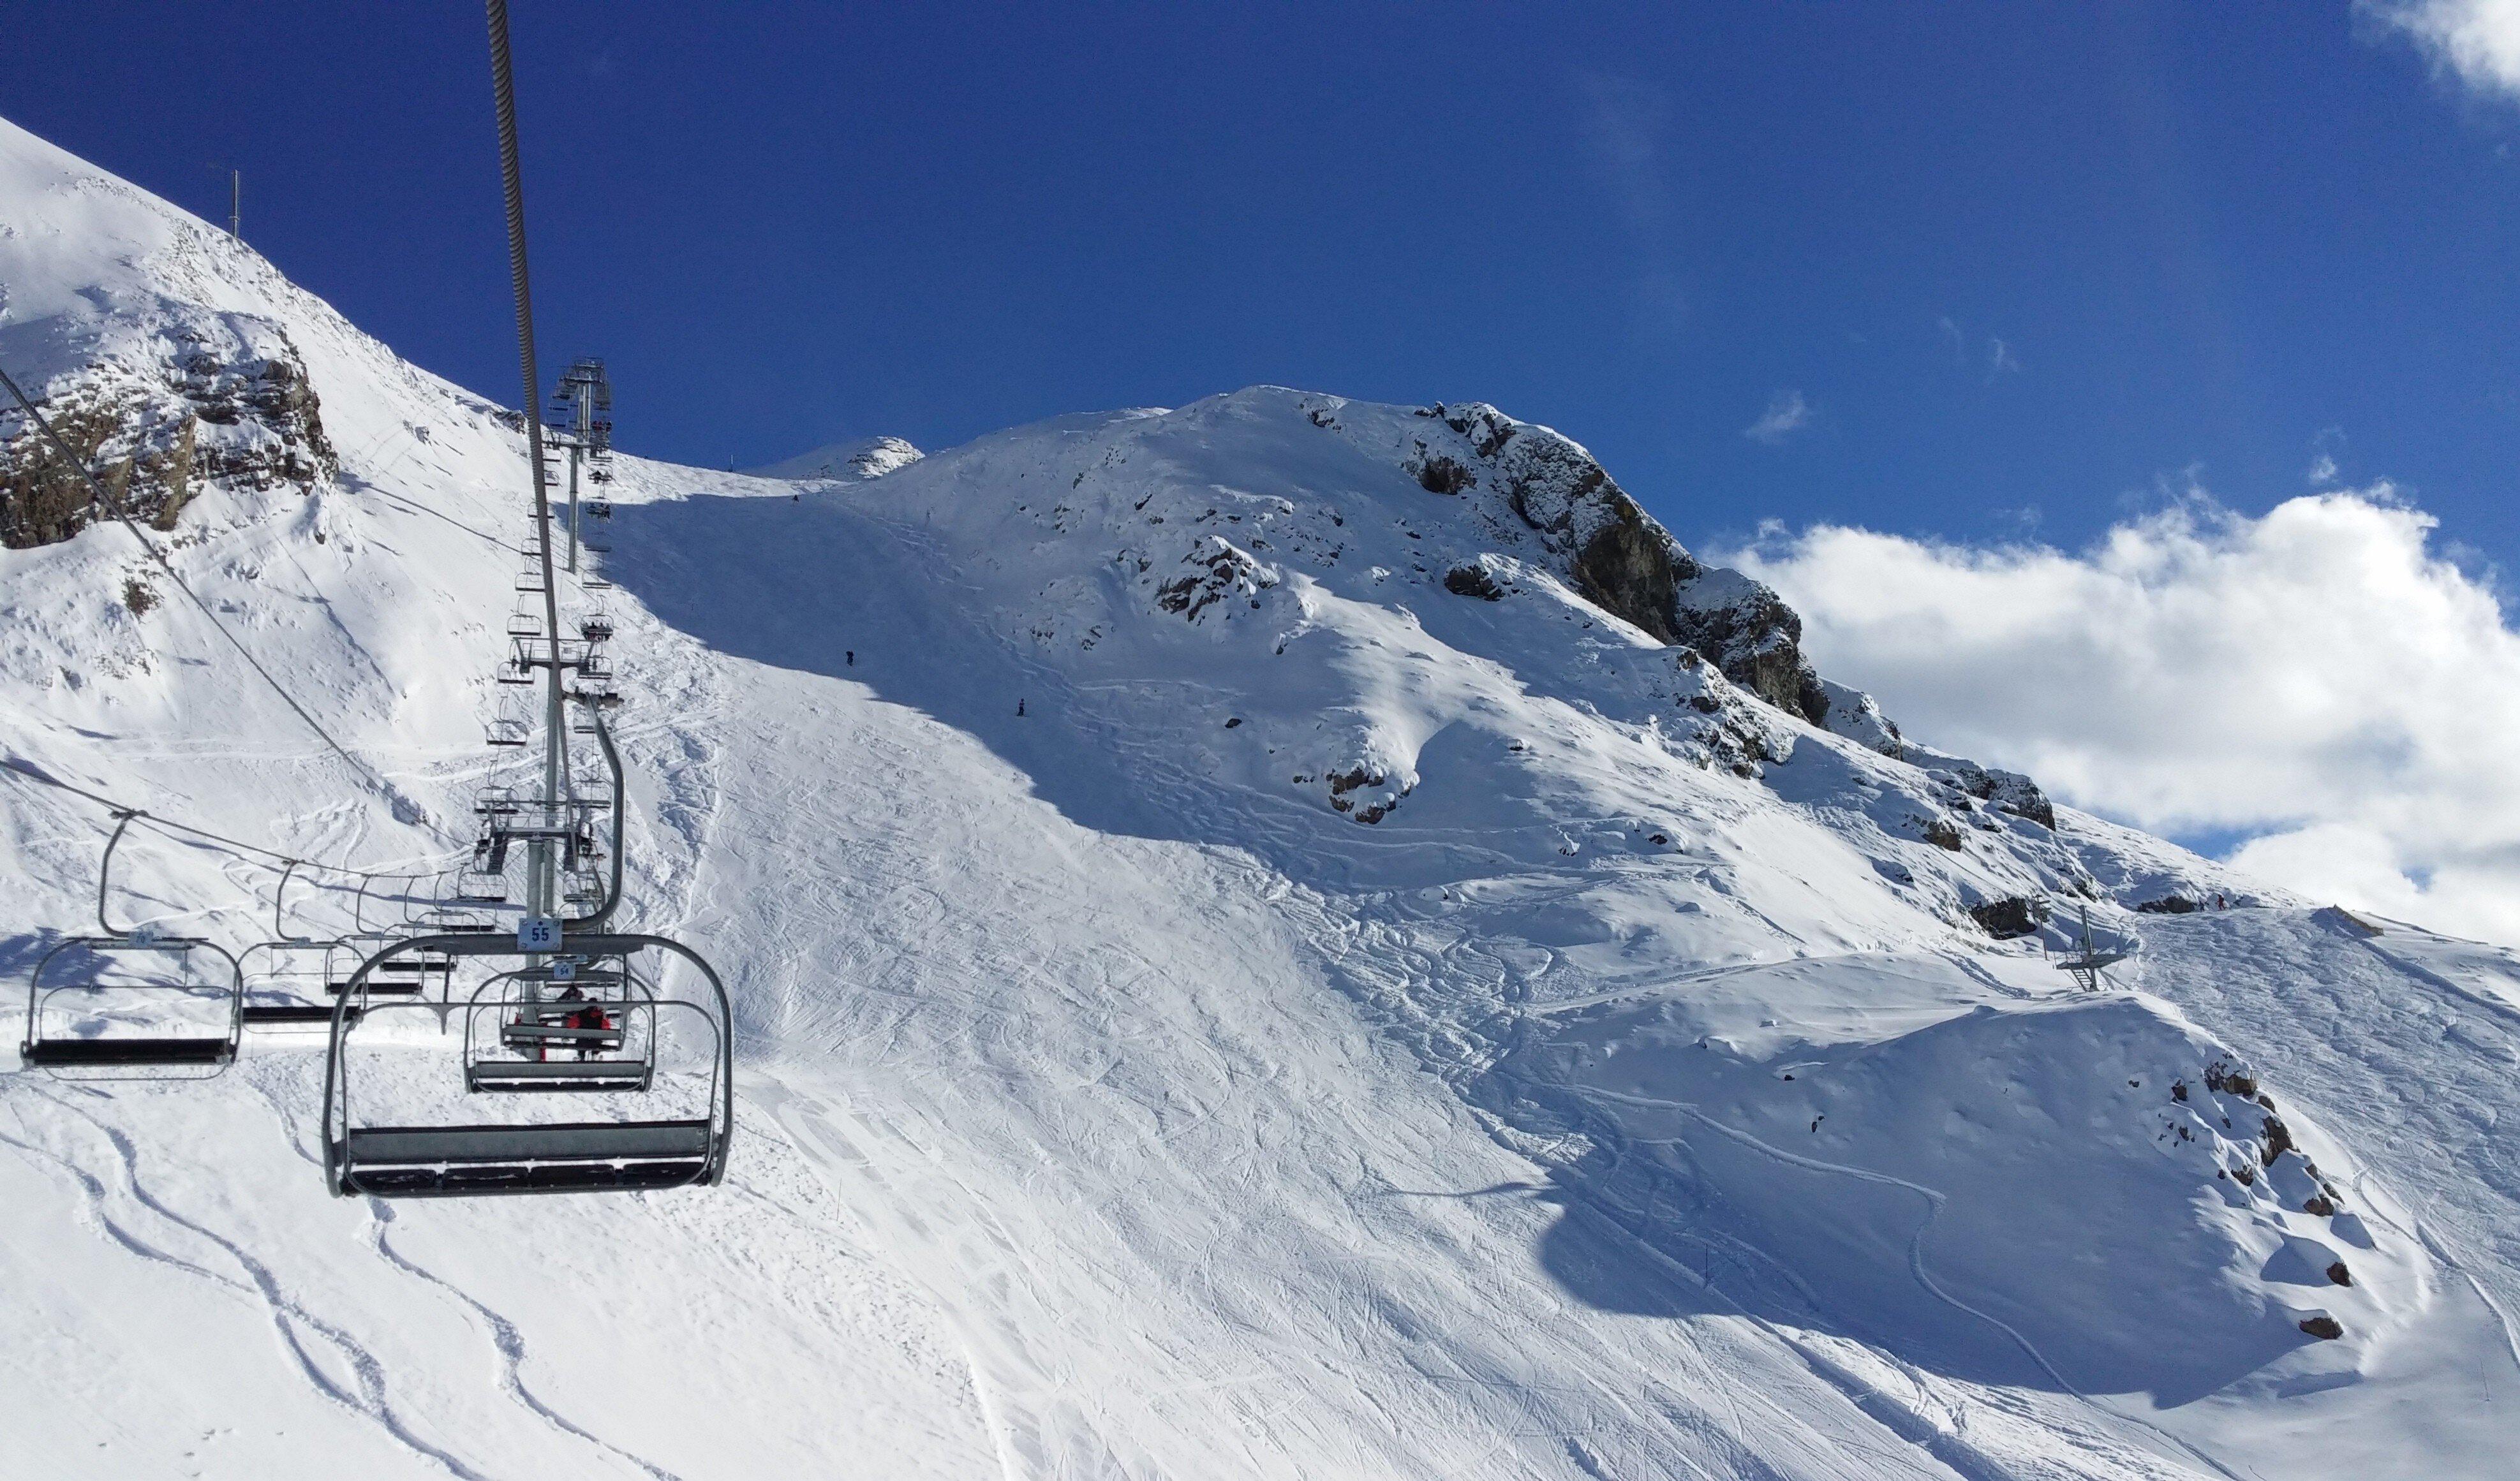 Snow Report Les 2 Alpes